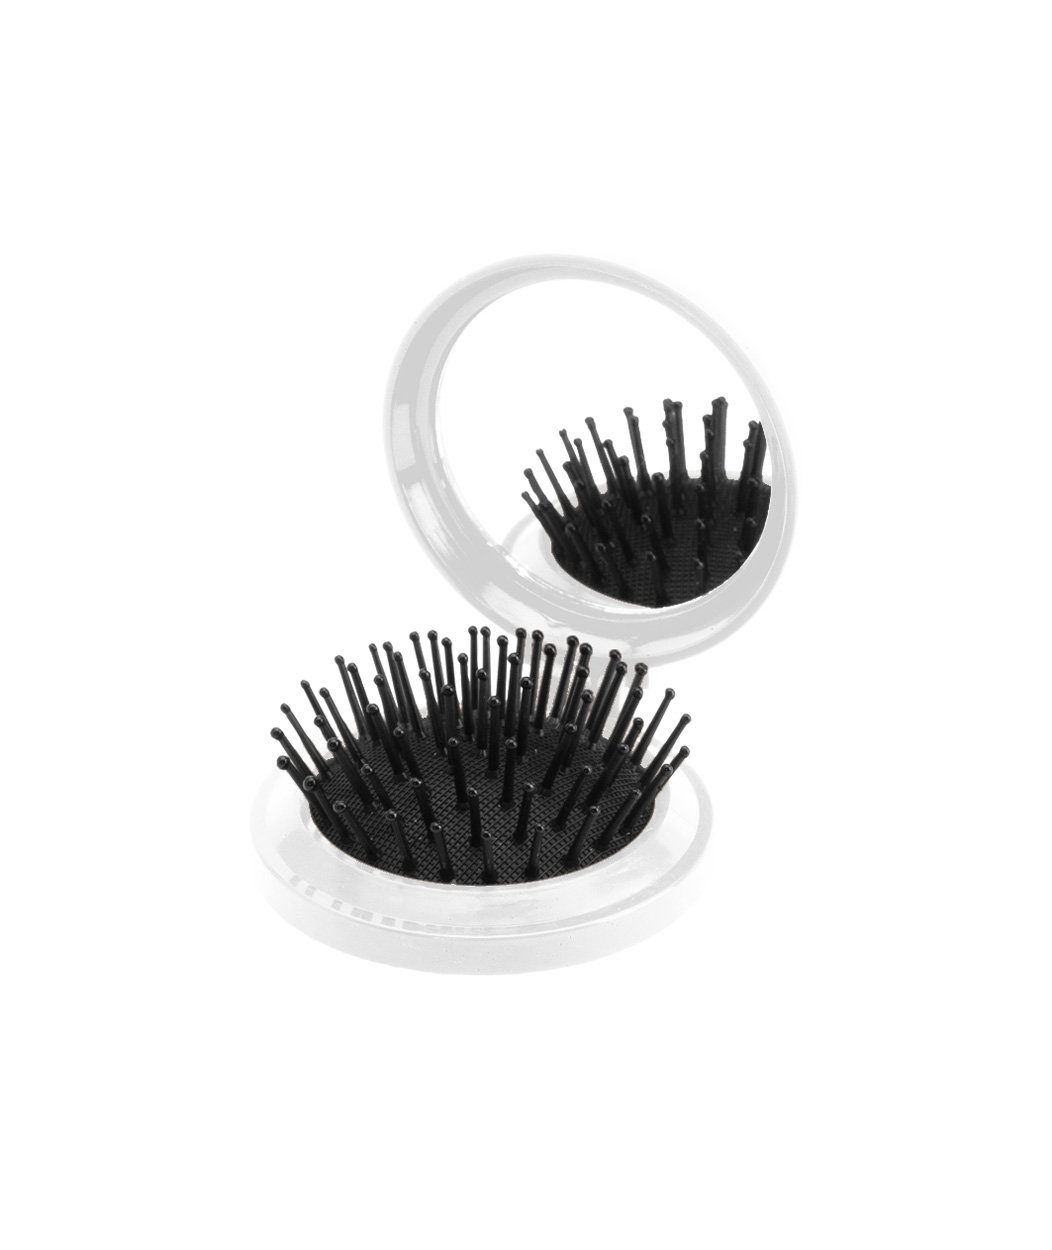 Glance mirror with hairbrush